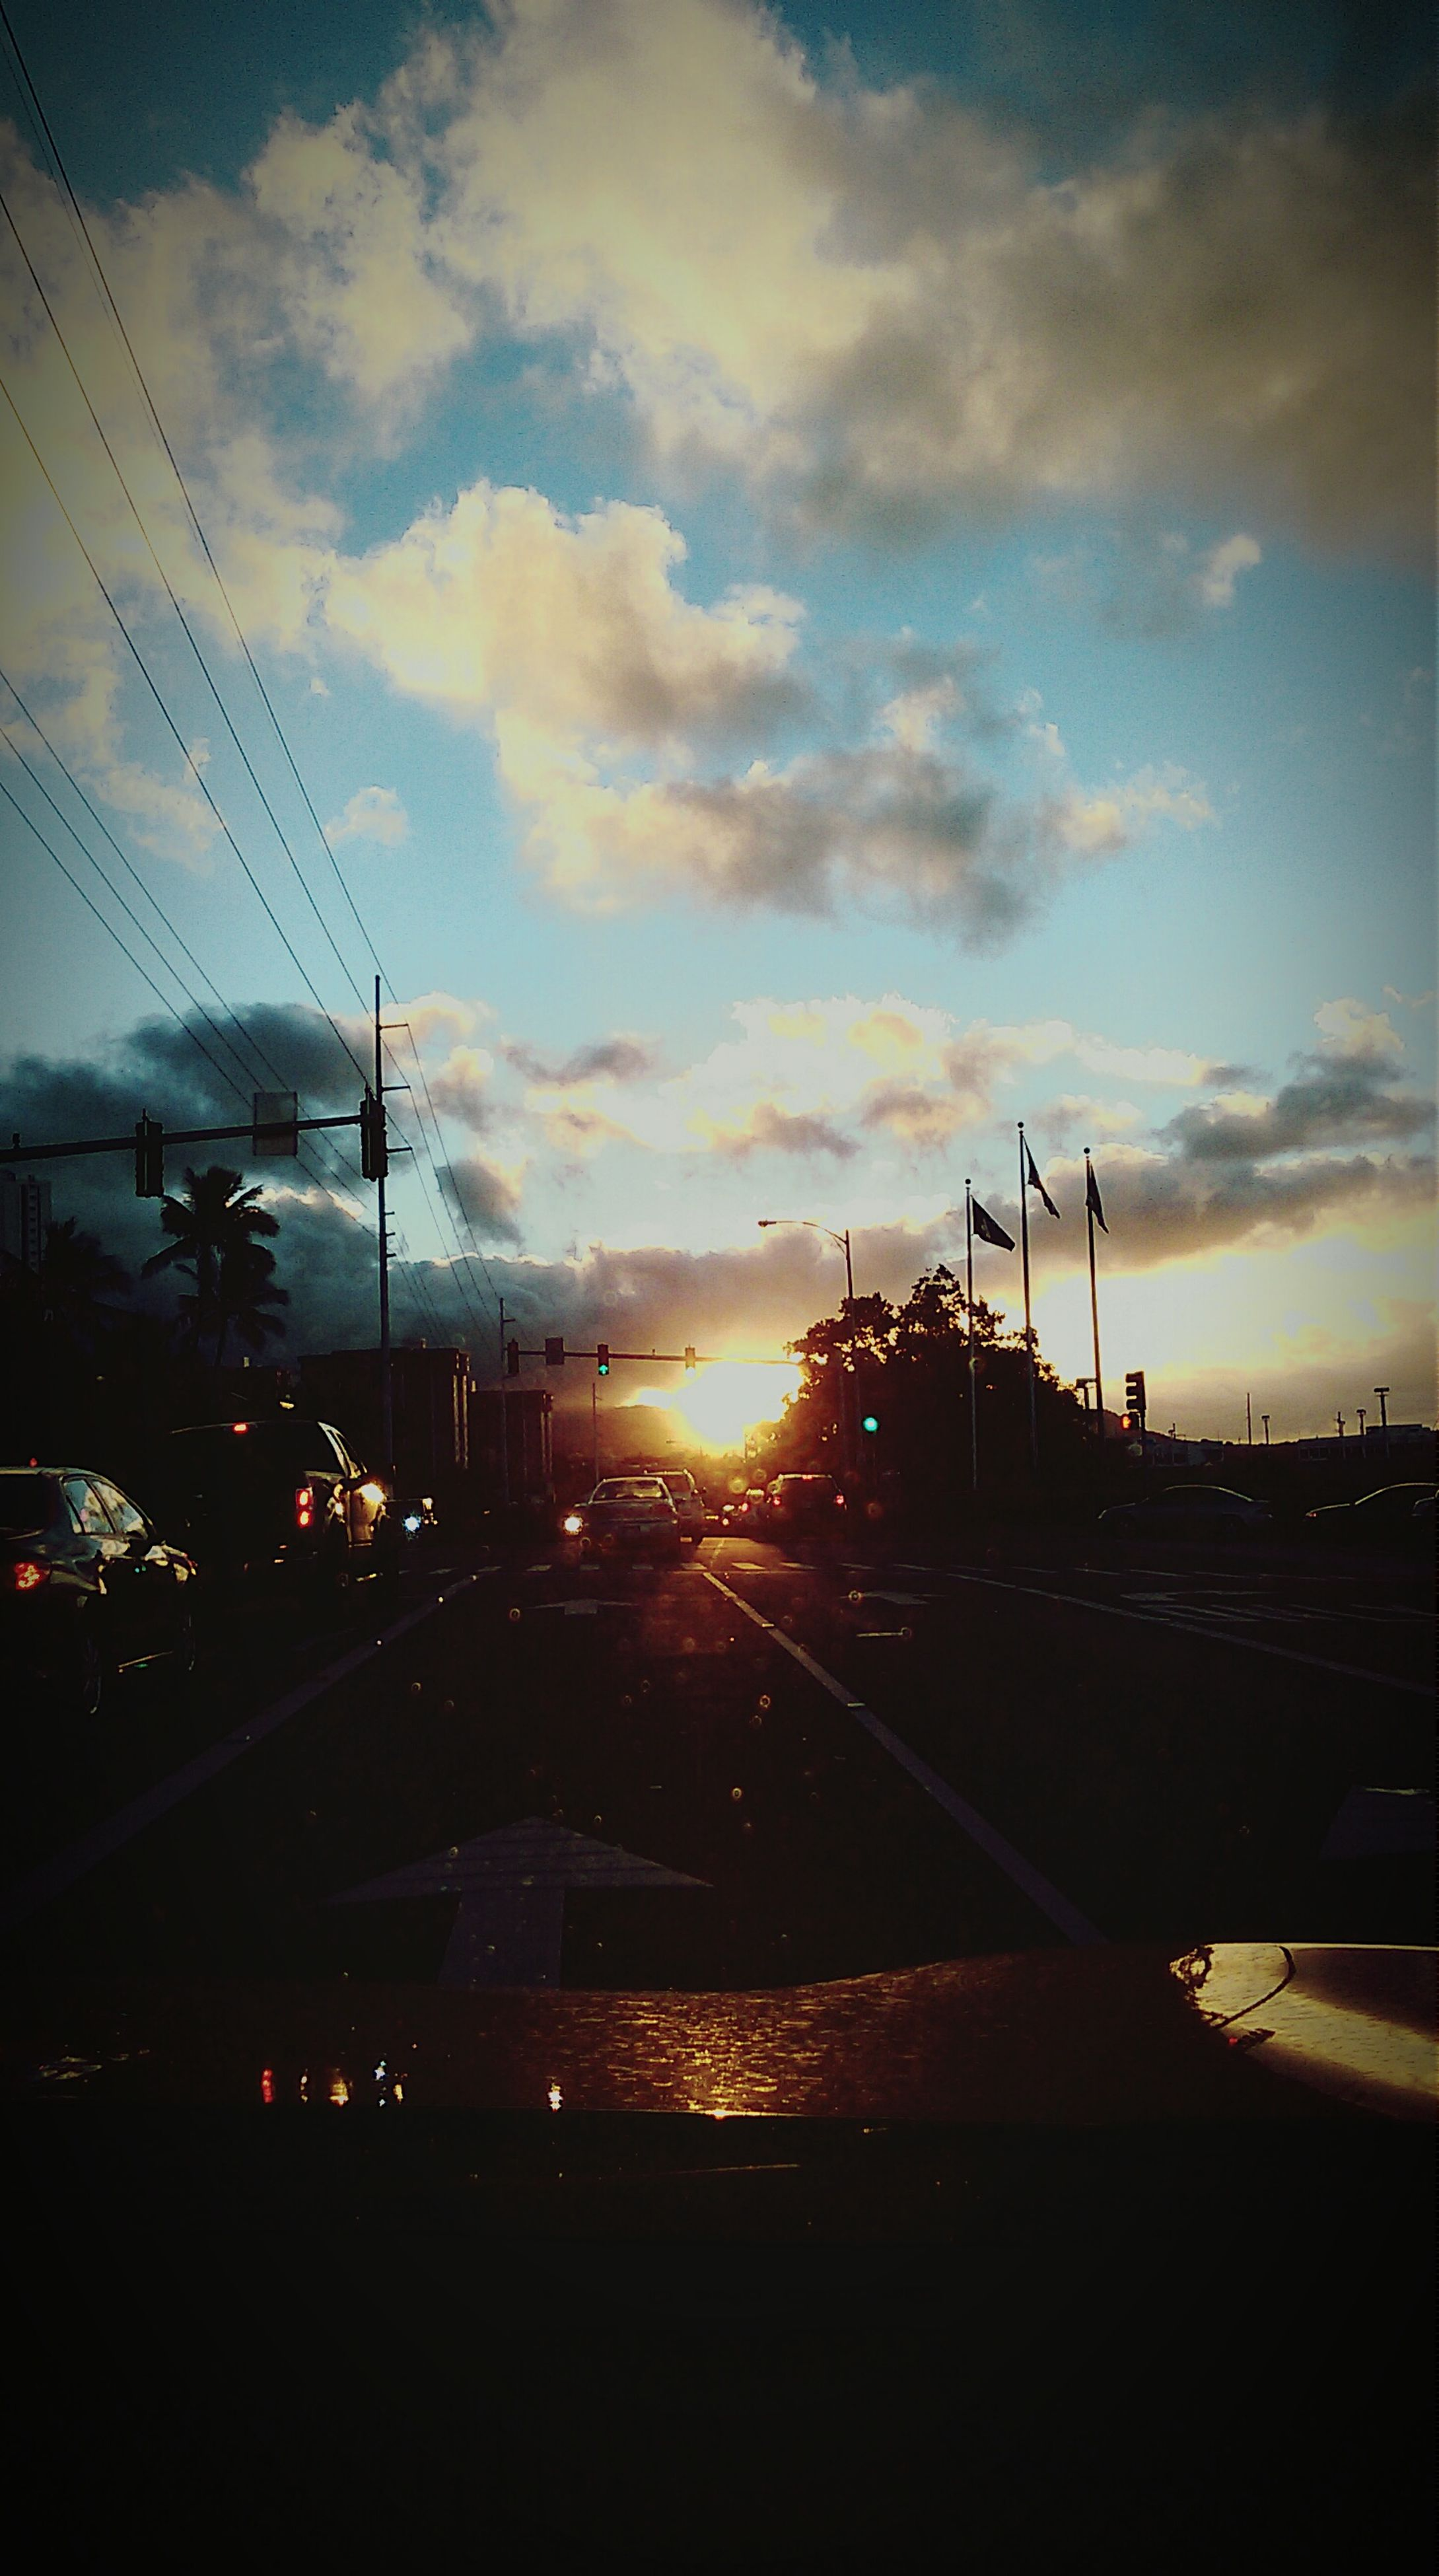 sunset, transportation, mode of transport, sky, car, sun, cloud - sky, land vehicle, orange color, road, silhouette, street light, street, sunlight, cloud, travel, no people, lens flare, on the move, cloudy